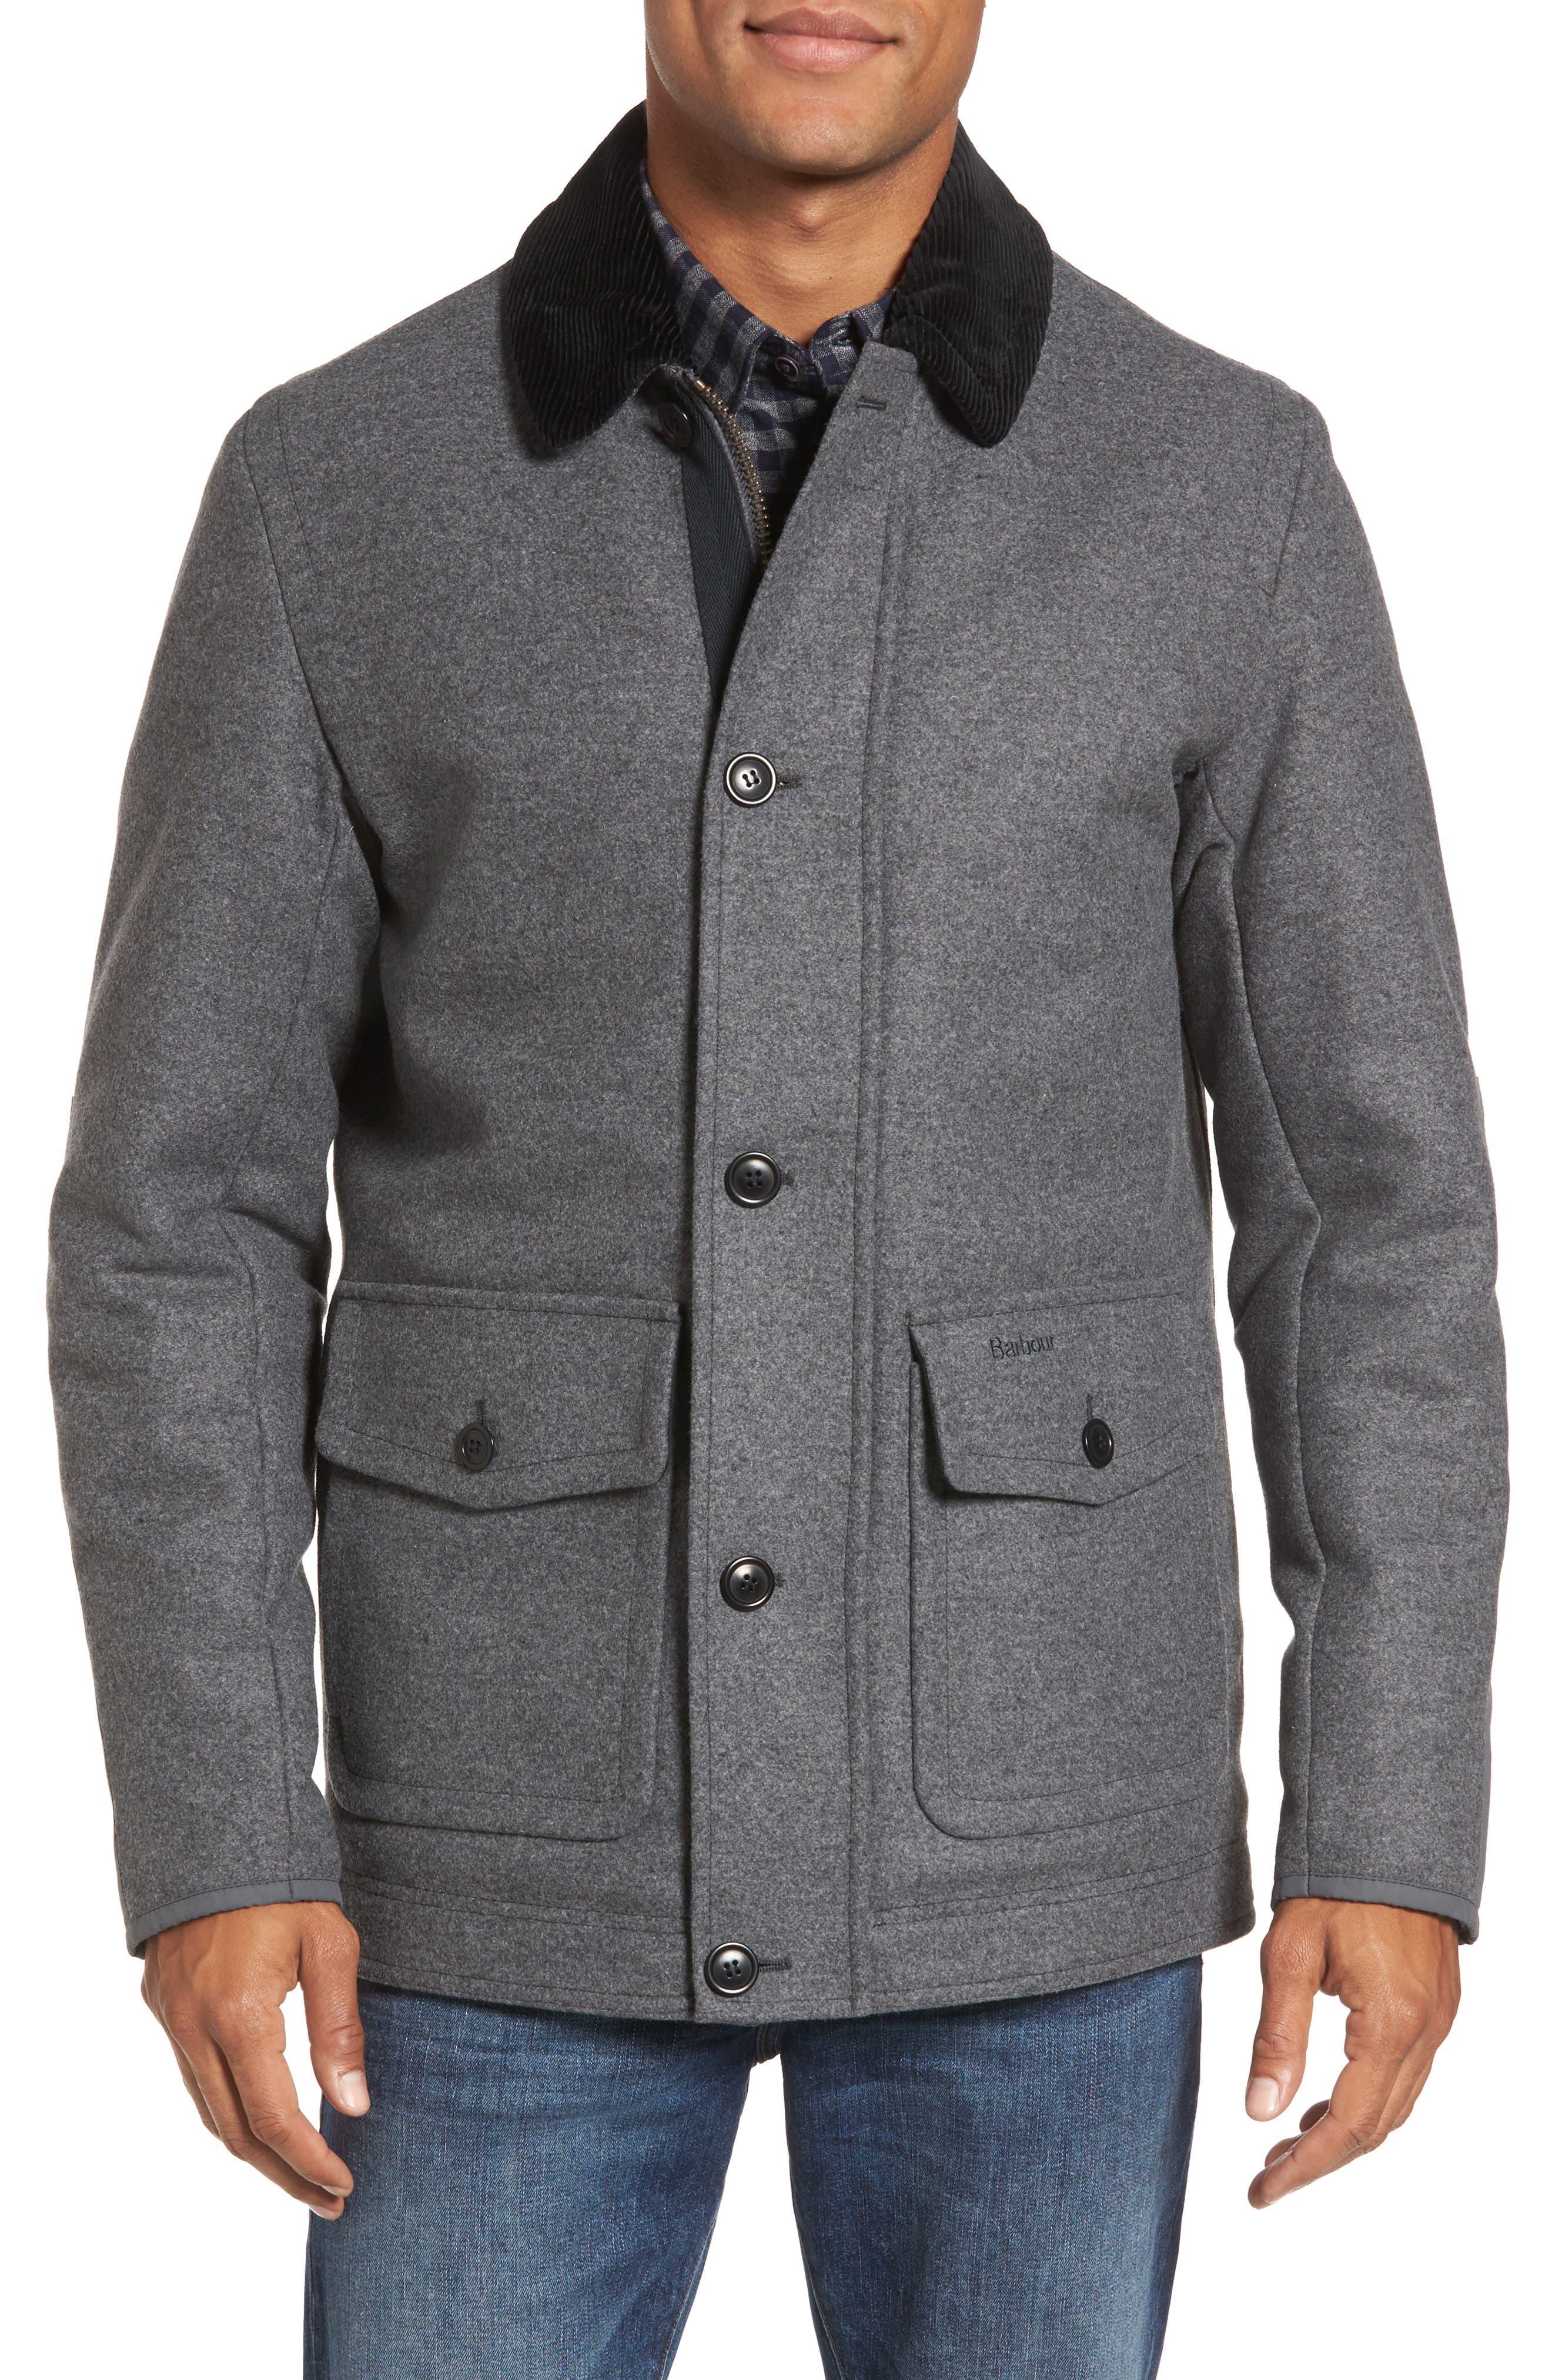 Chingle Wool Blend Deck Jacket,                             Alternate thumbnail 4, color,